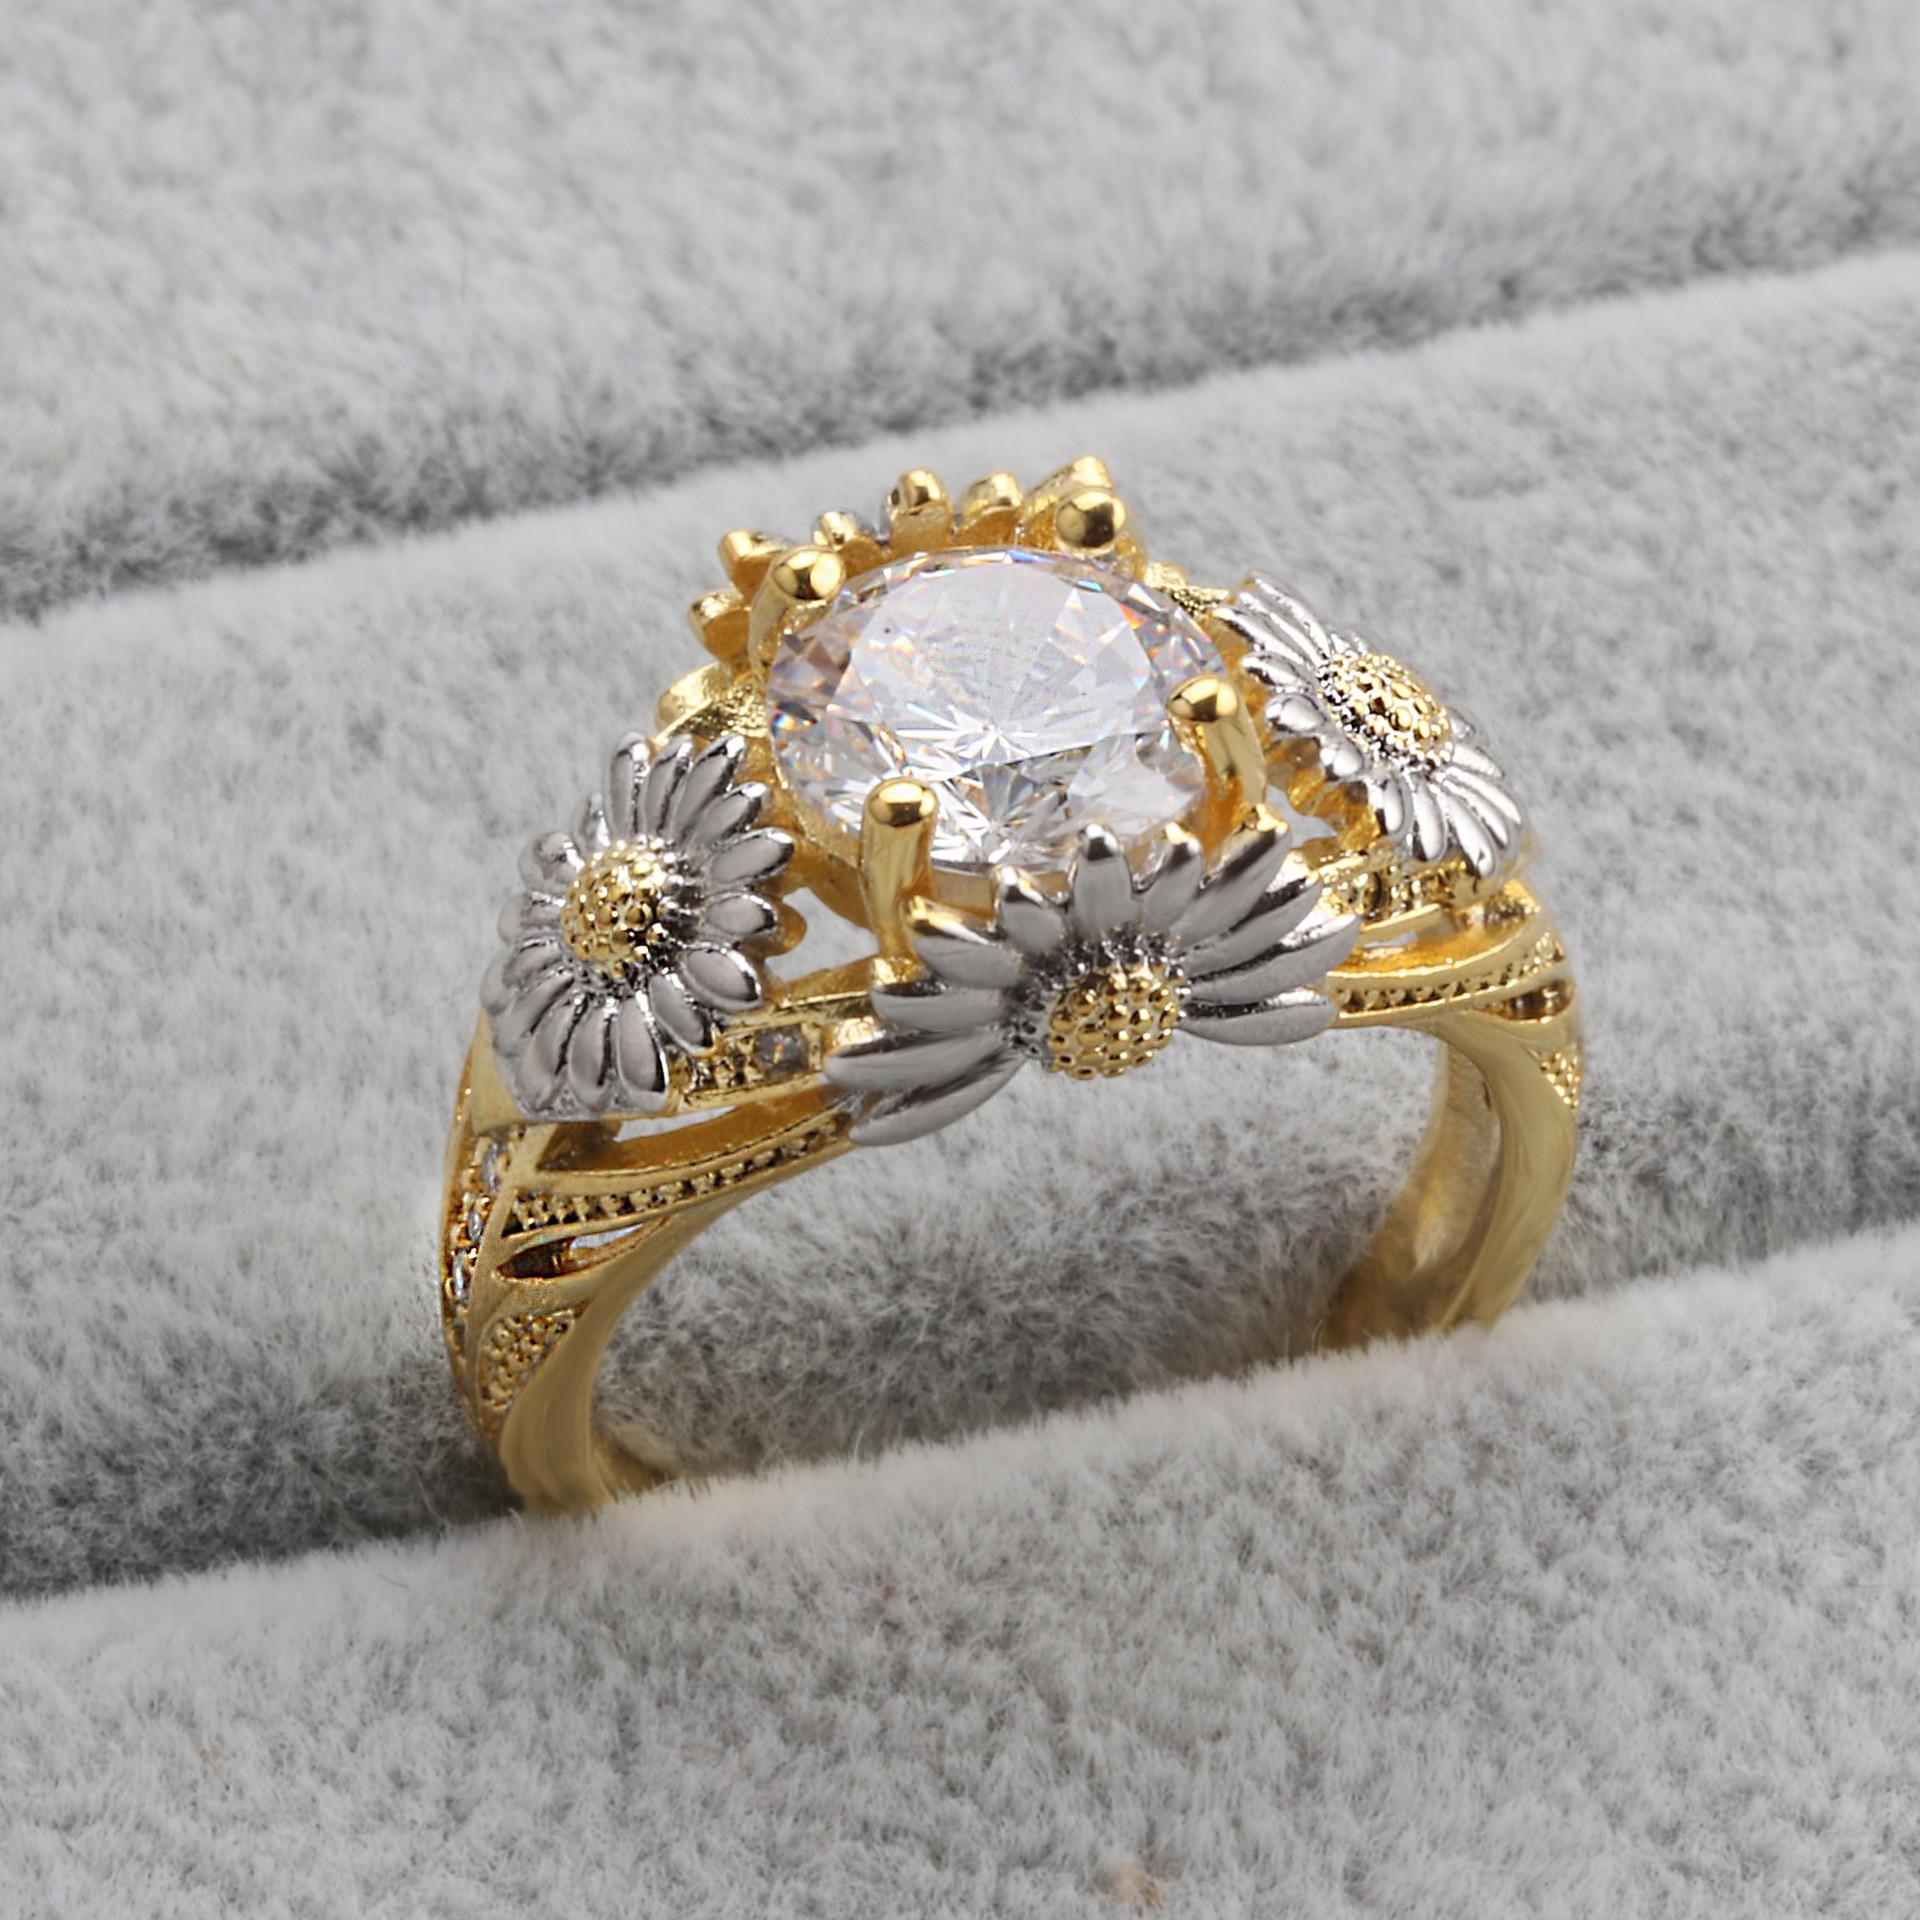 14K Gold VVS1 Diamond Ring For Women Bizuteria 2 Carats Topaz Gemstone Anillos De Wedding Jewelry 14K Gold Diamond Dainty Ring